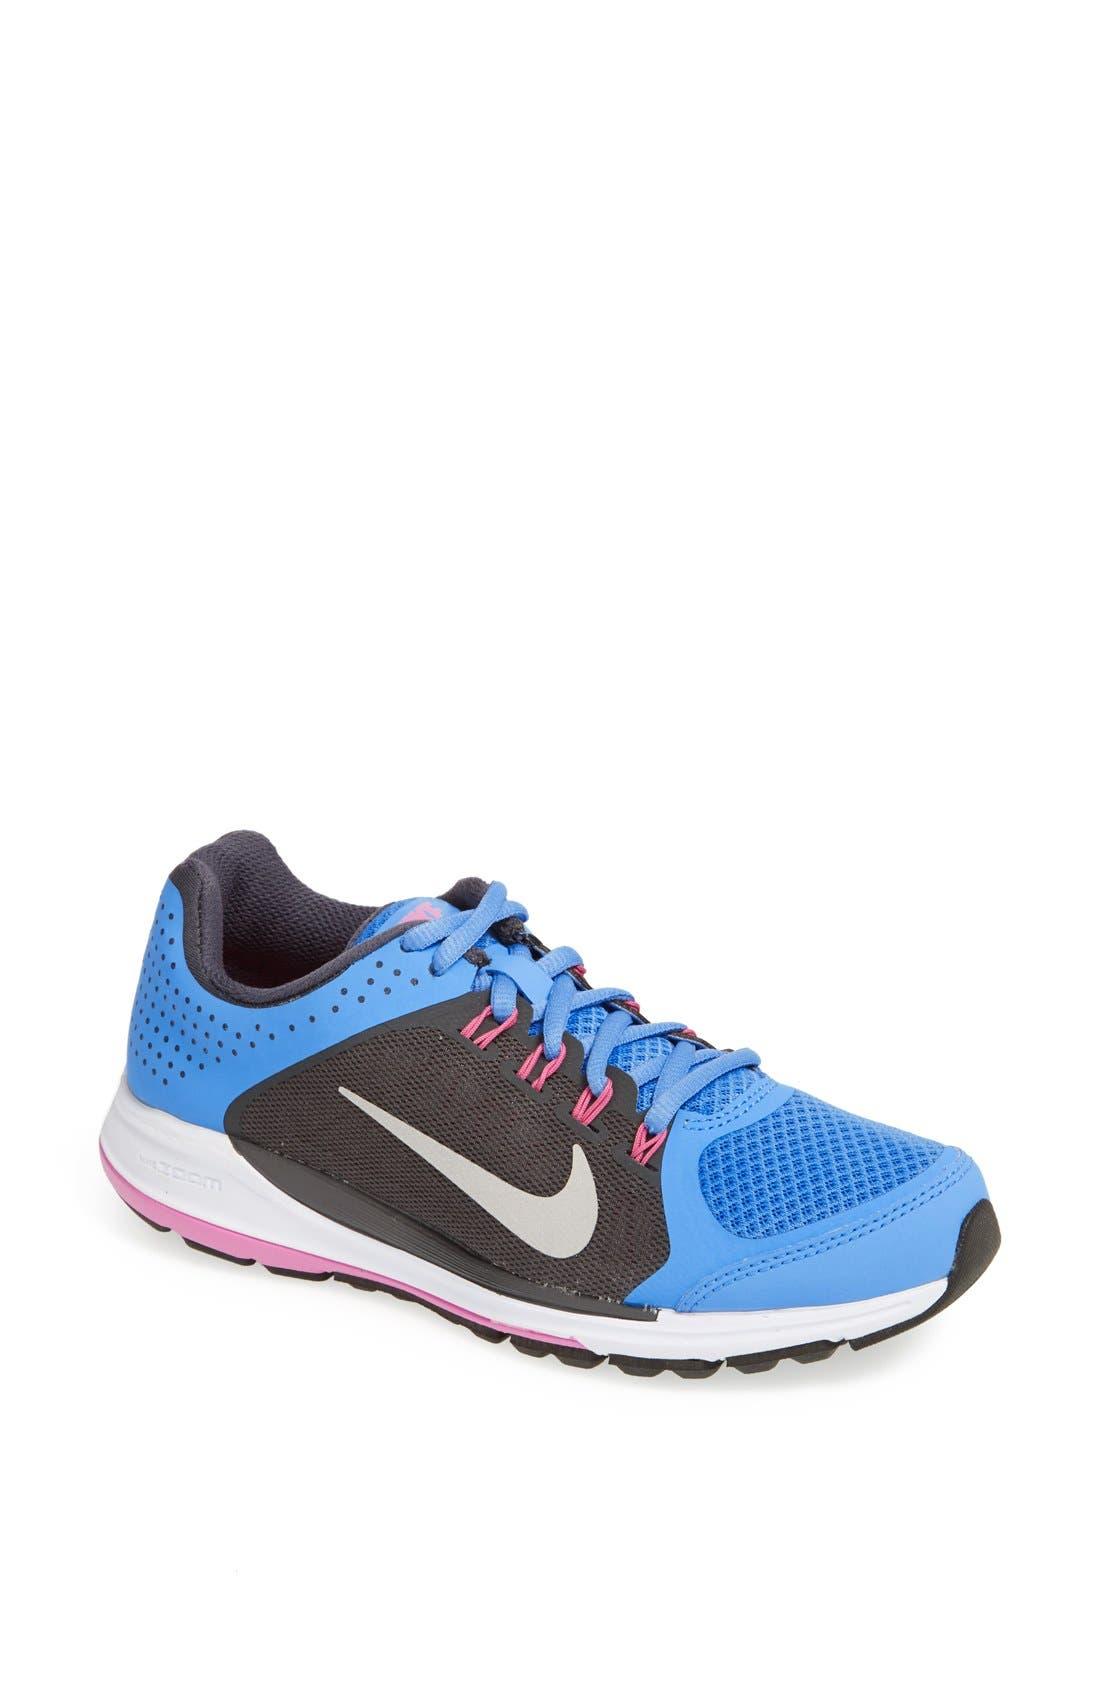 Alternate Image 1 Selected - Nike 'Zoom Elite+ 6' Running Shoe (Women)